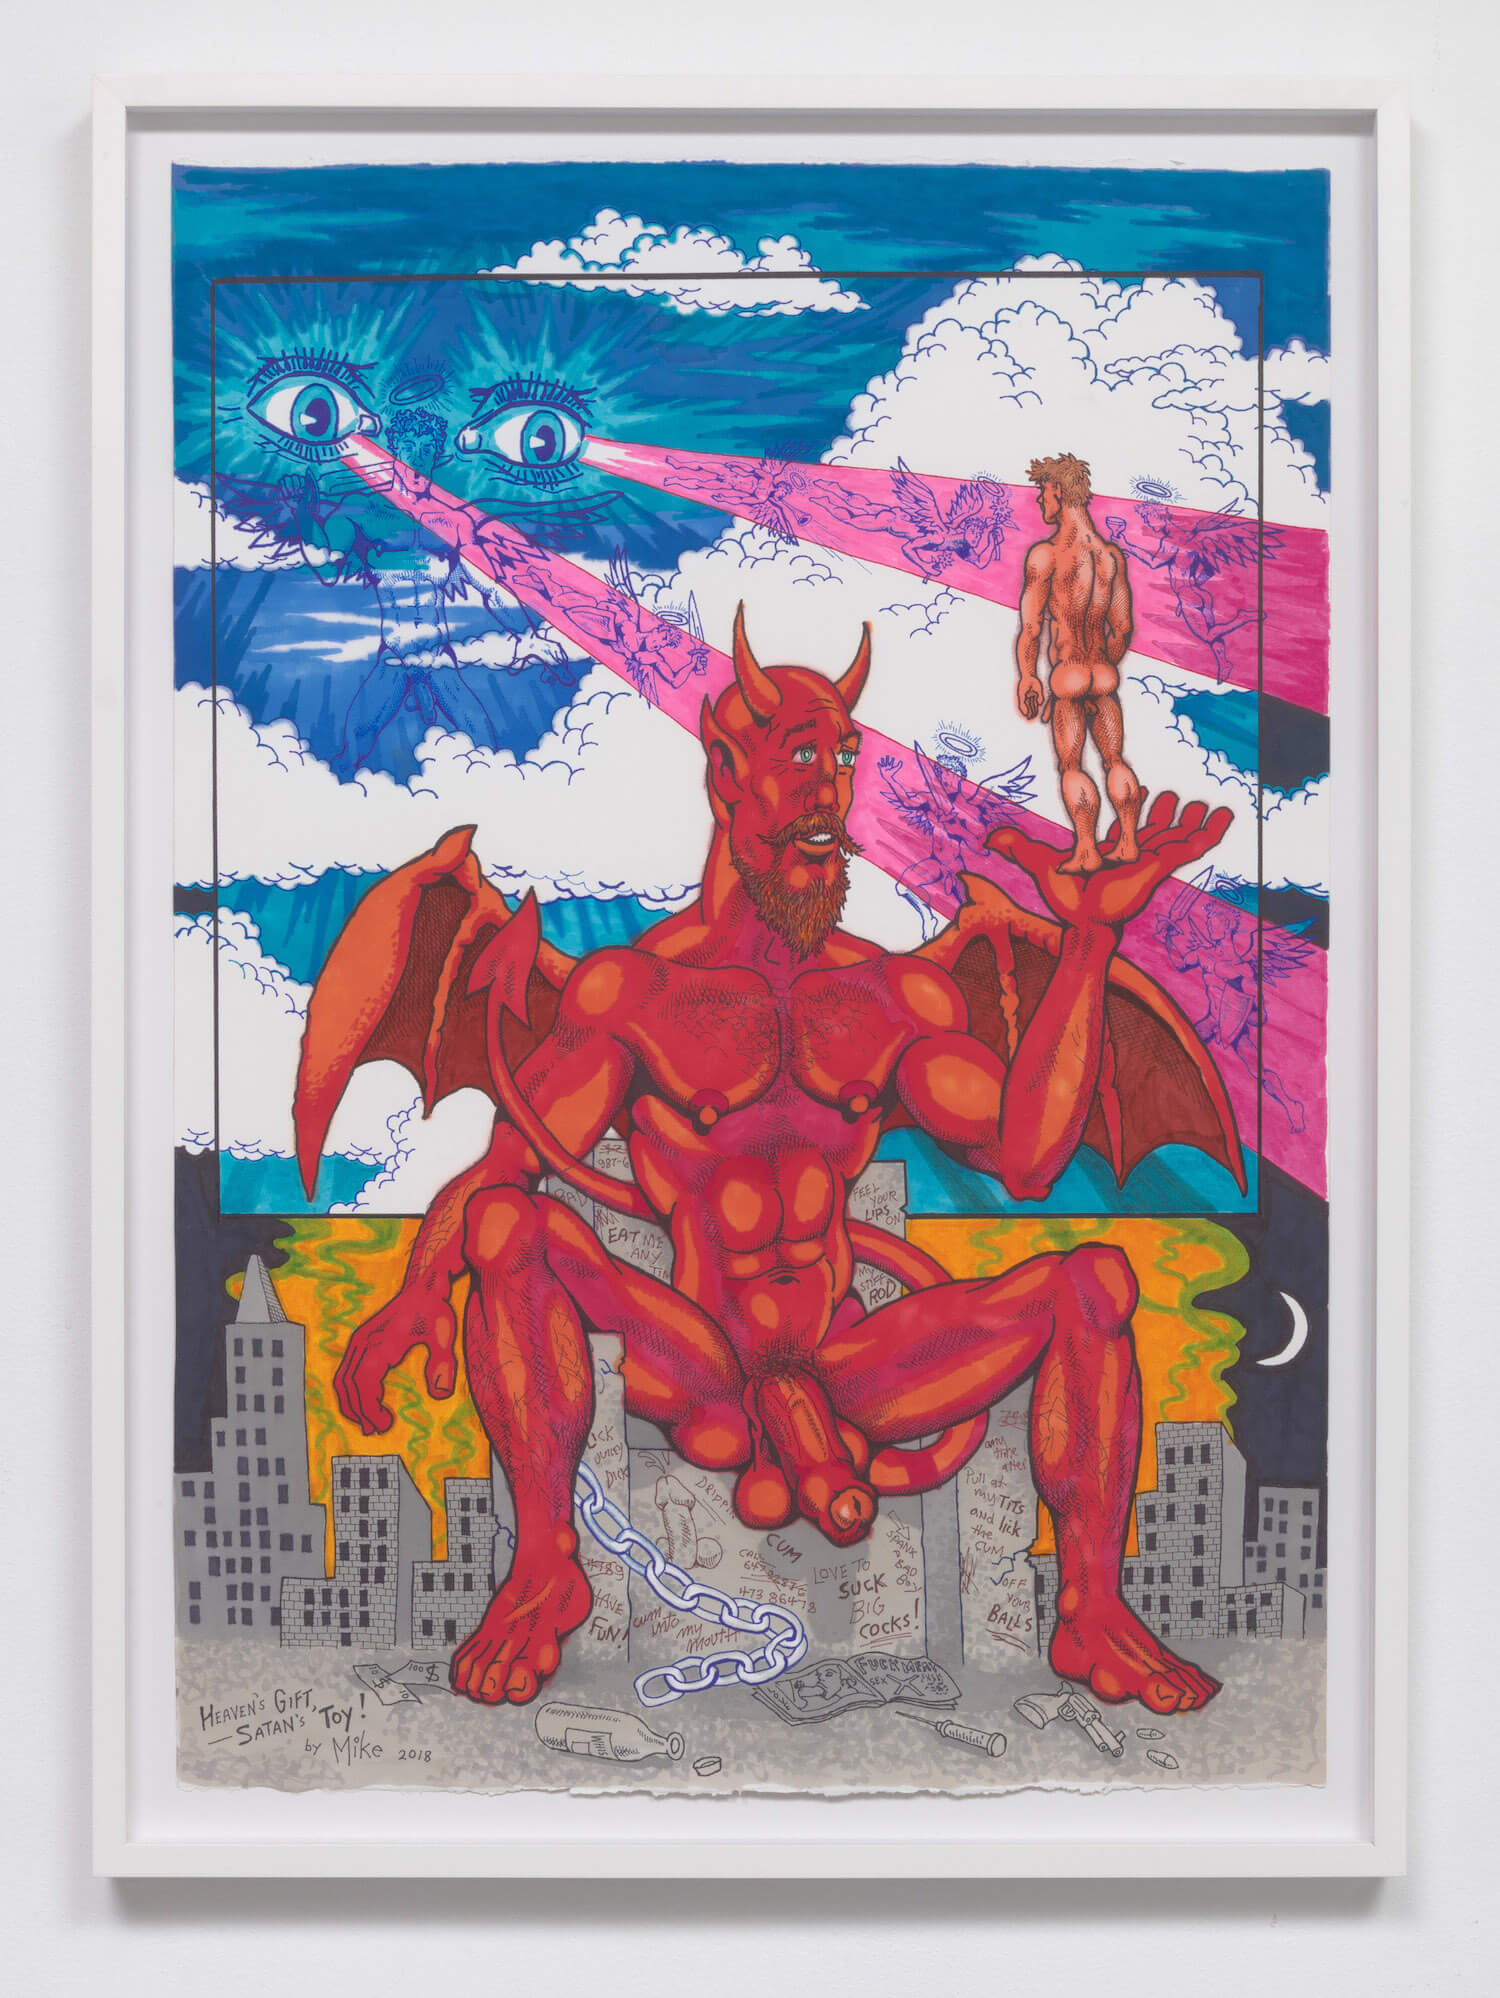 Kuchar, Heaven's Gift, Satan's Toy, 2018 (MK 18.006) A